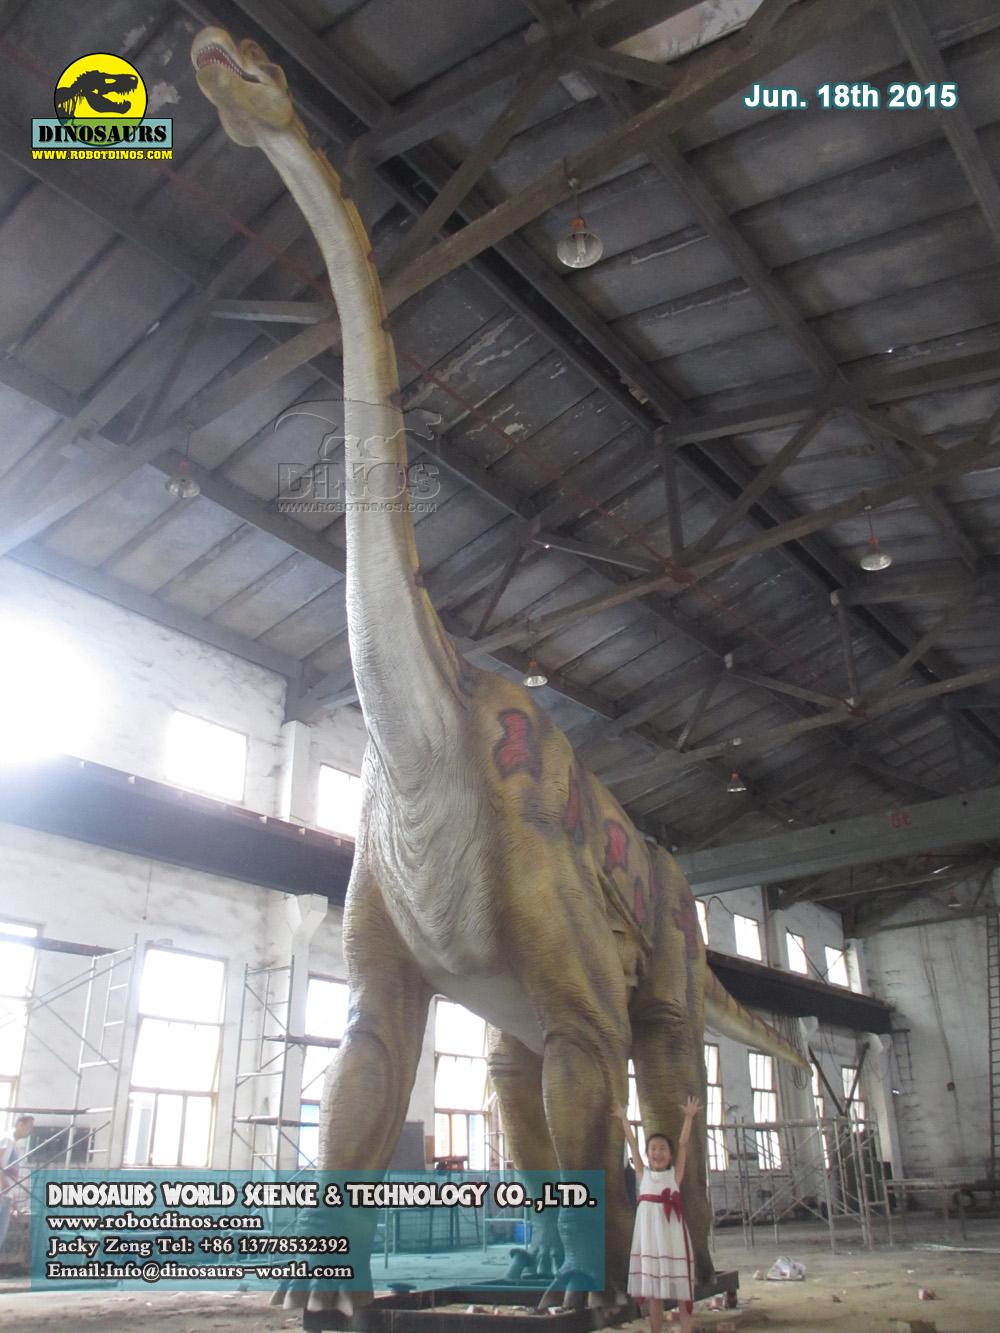 Huge Brachiosaurus